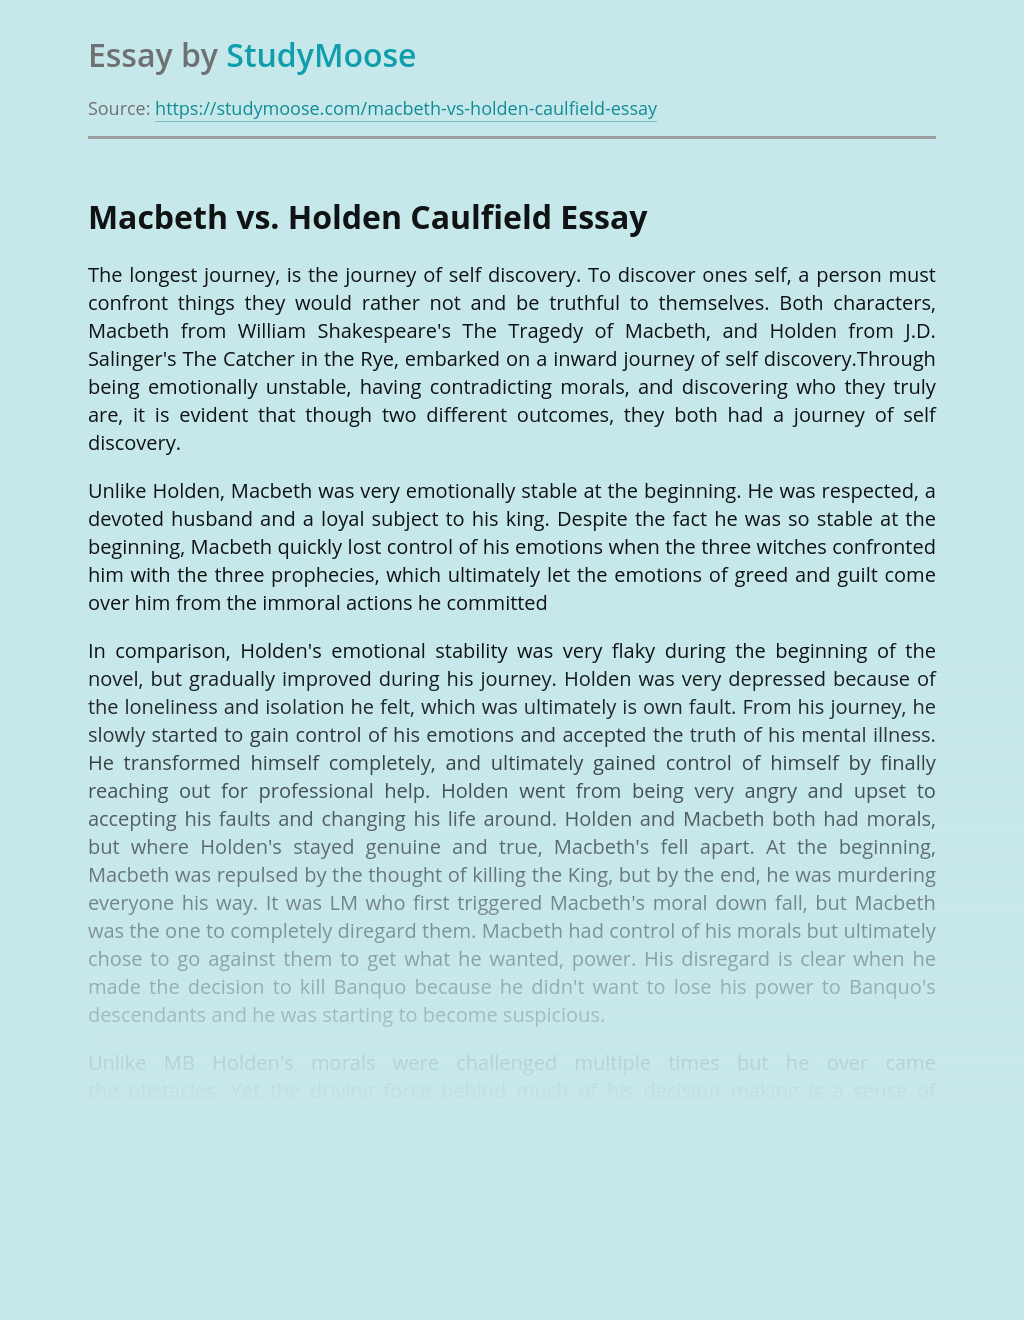 Macbeth vs. Holden Caulfield